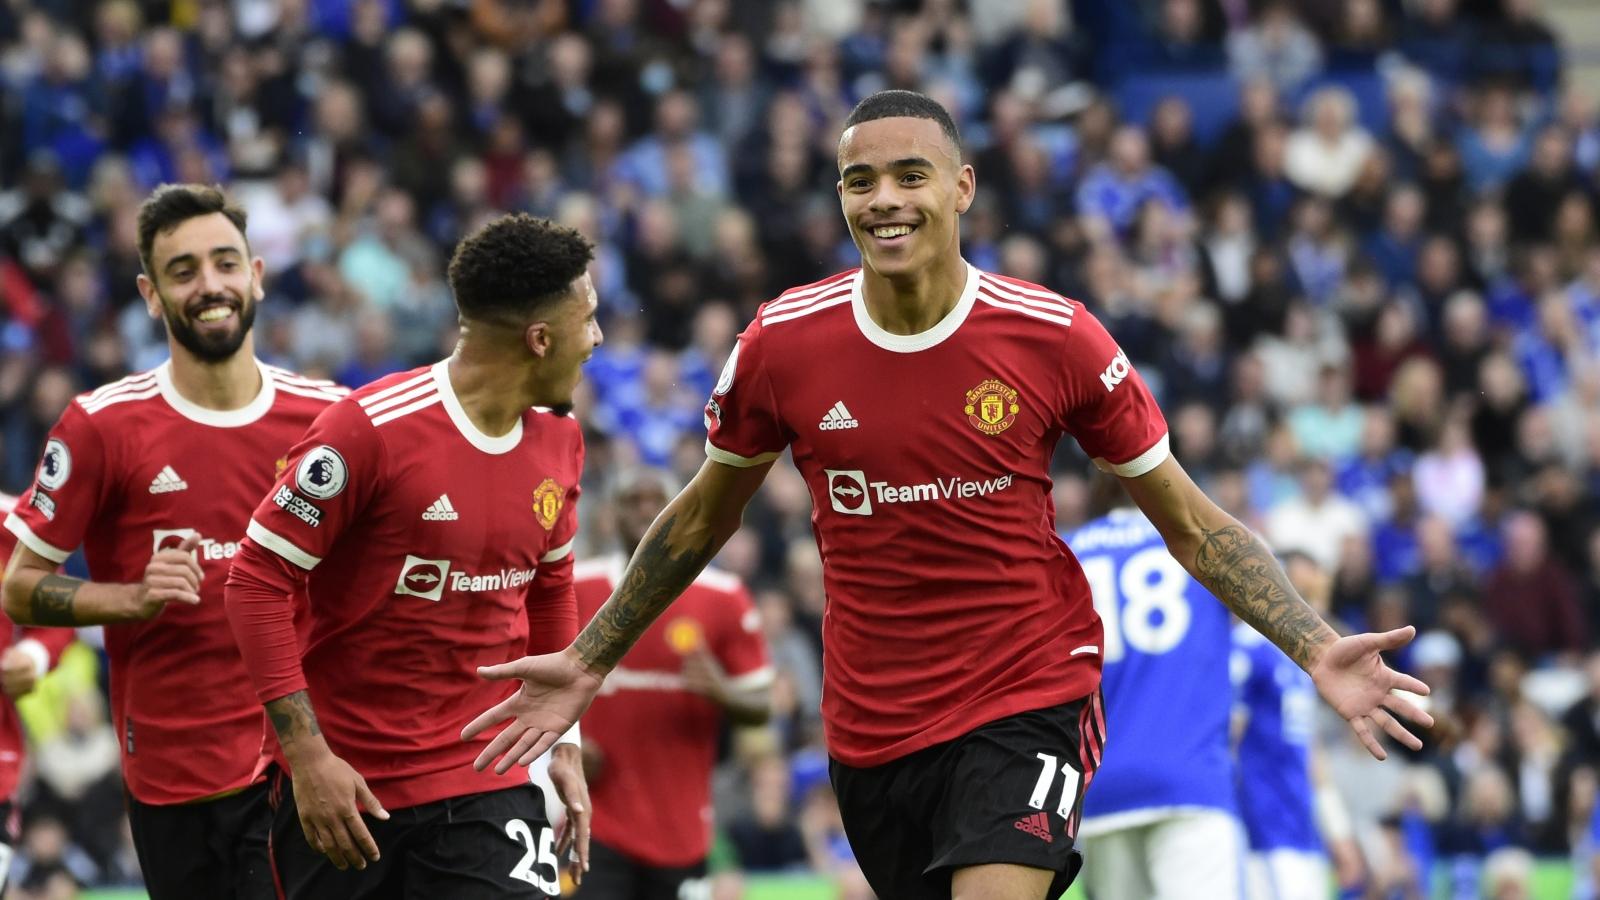 TRỰC TIẾP Leicester City 1-1 MU: Ronaldo bỏ lỡ cơ hội ghi bàn